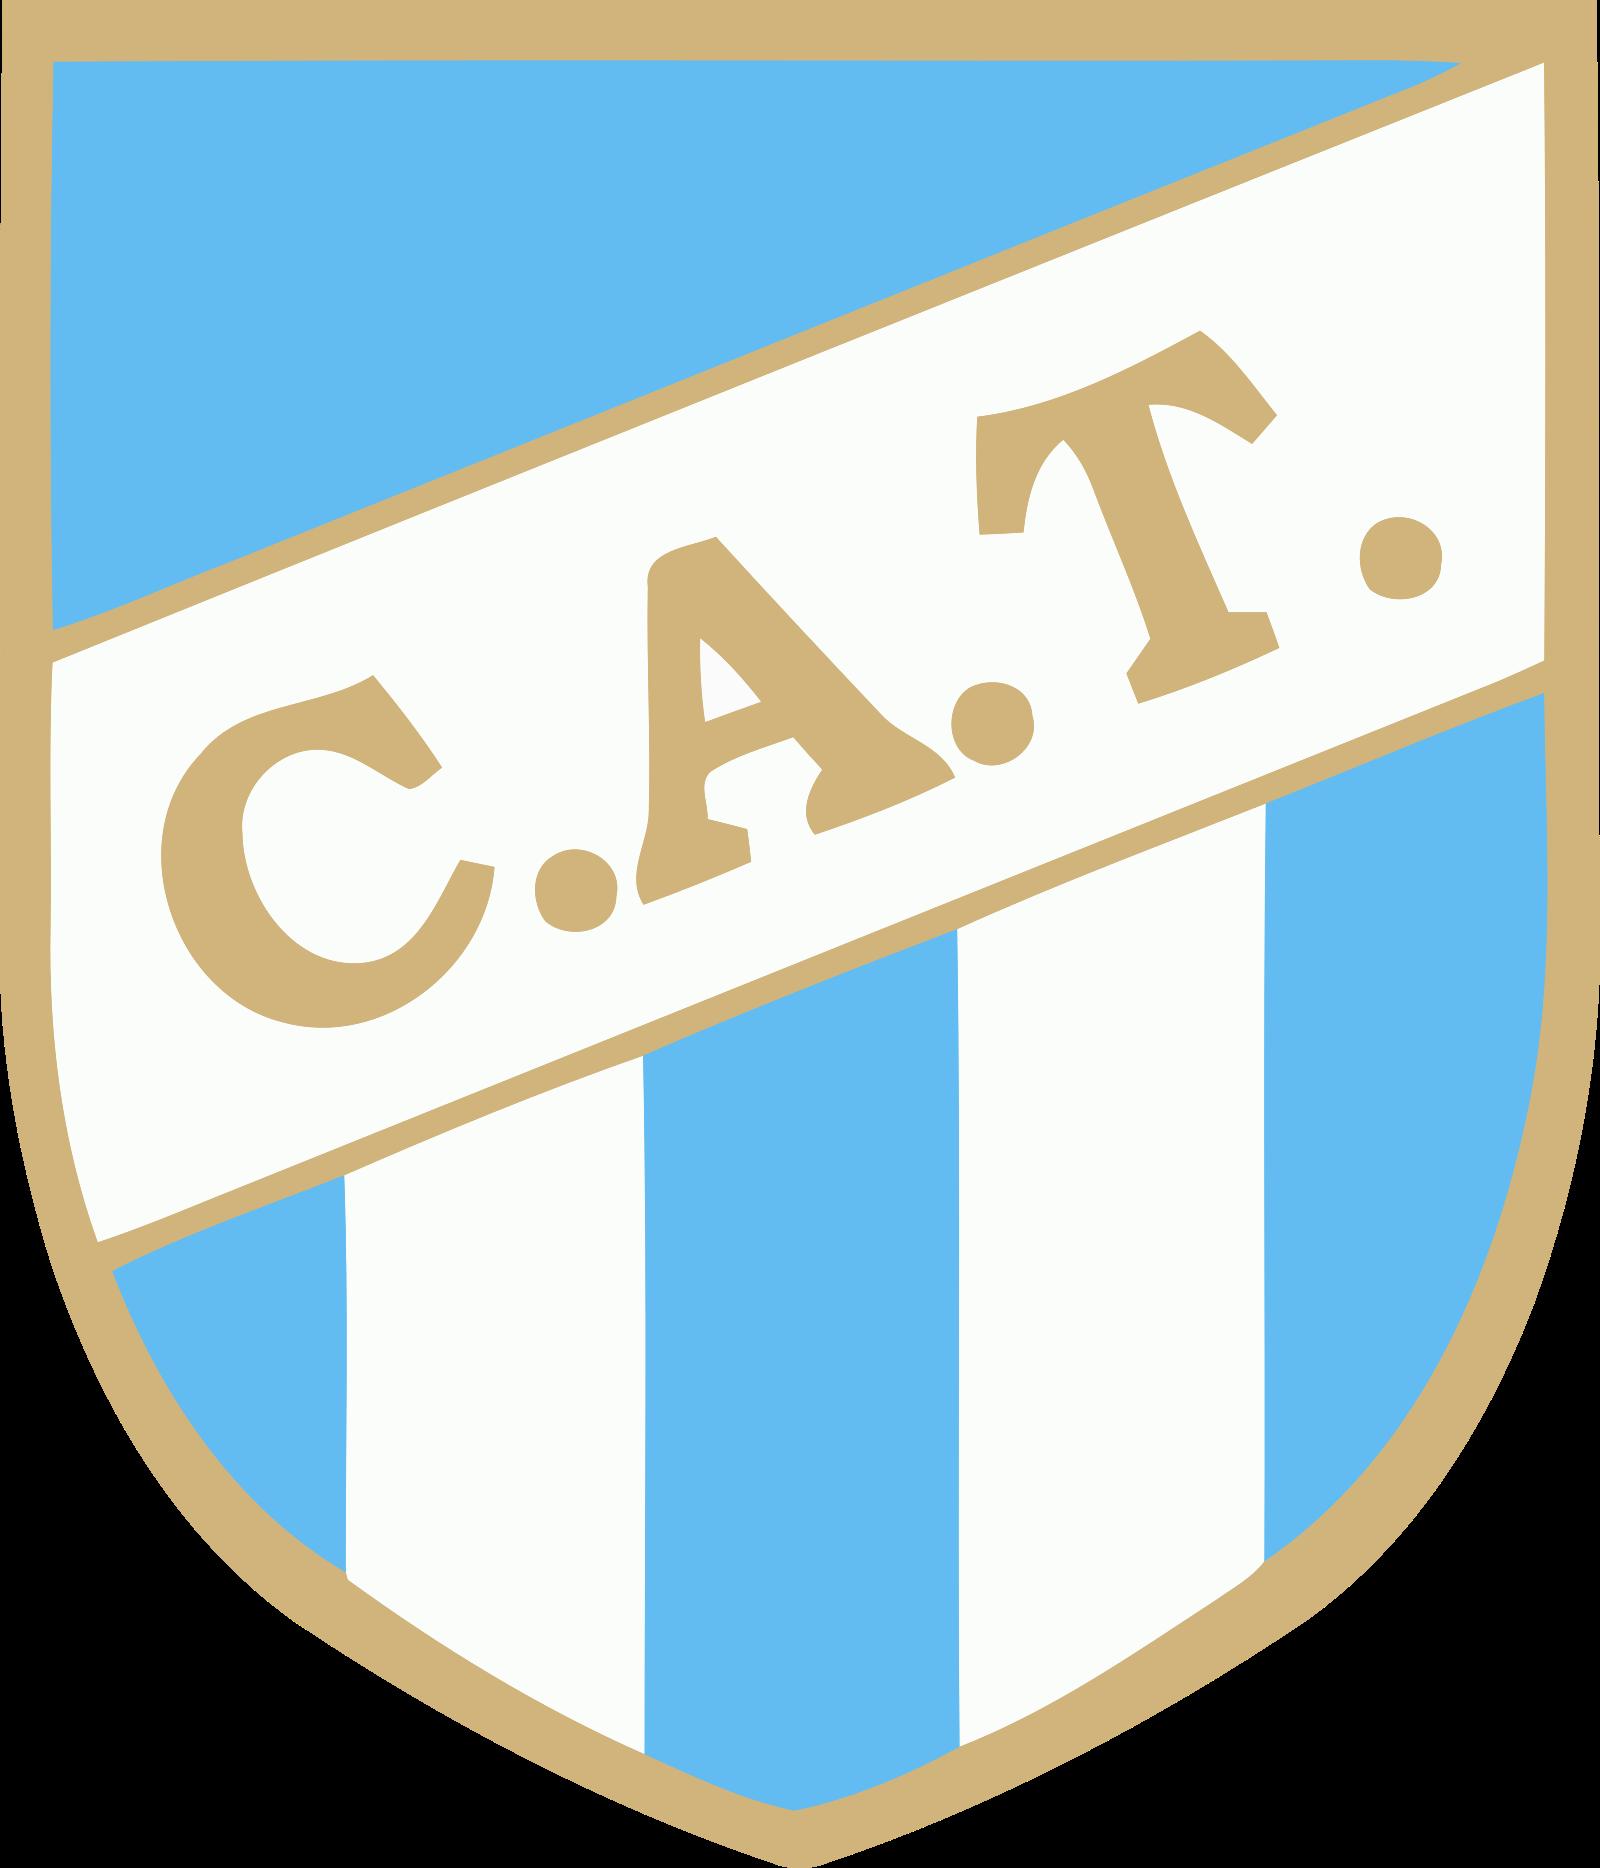 atletico tucuman logo escudo 2 - Club Atlético Tucumán Logo